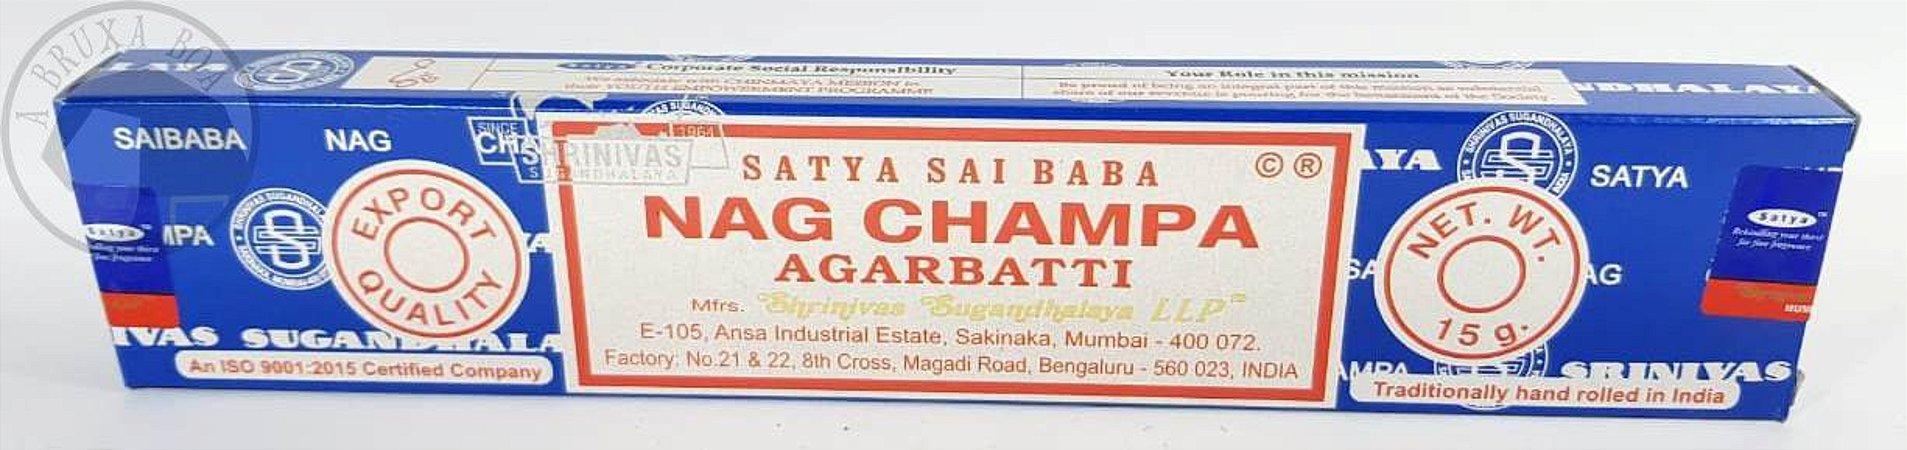 Incenso Nag Champa Agarbathi